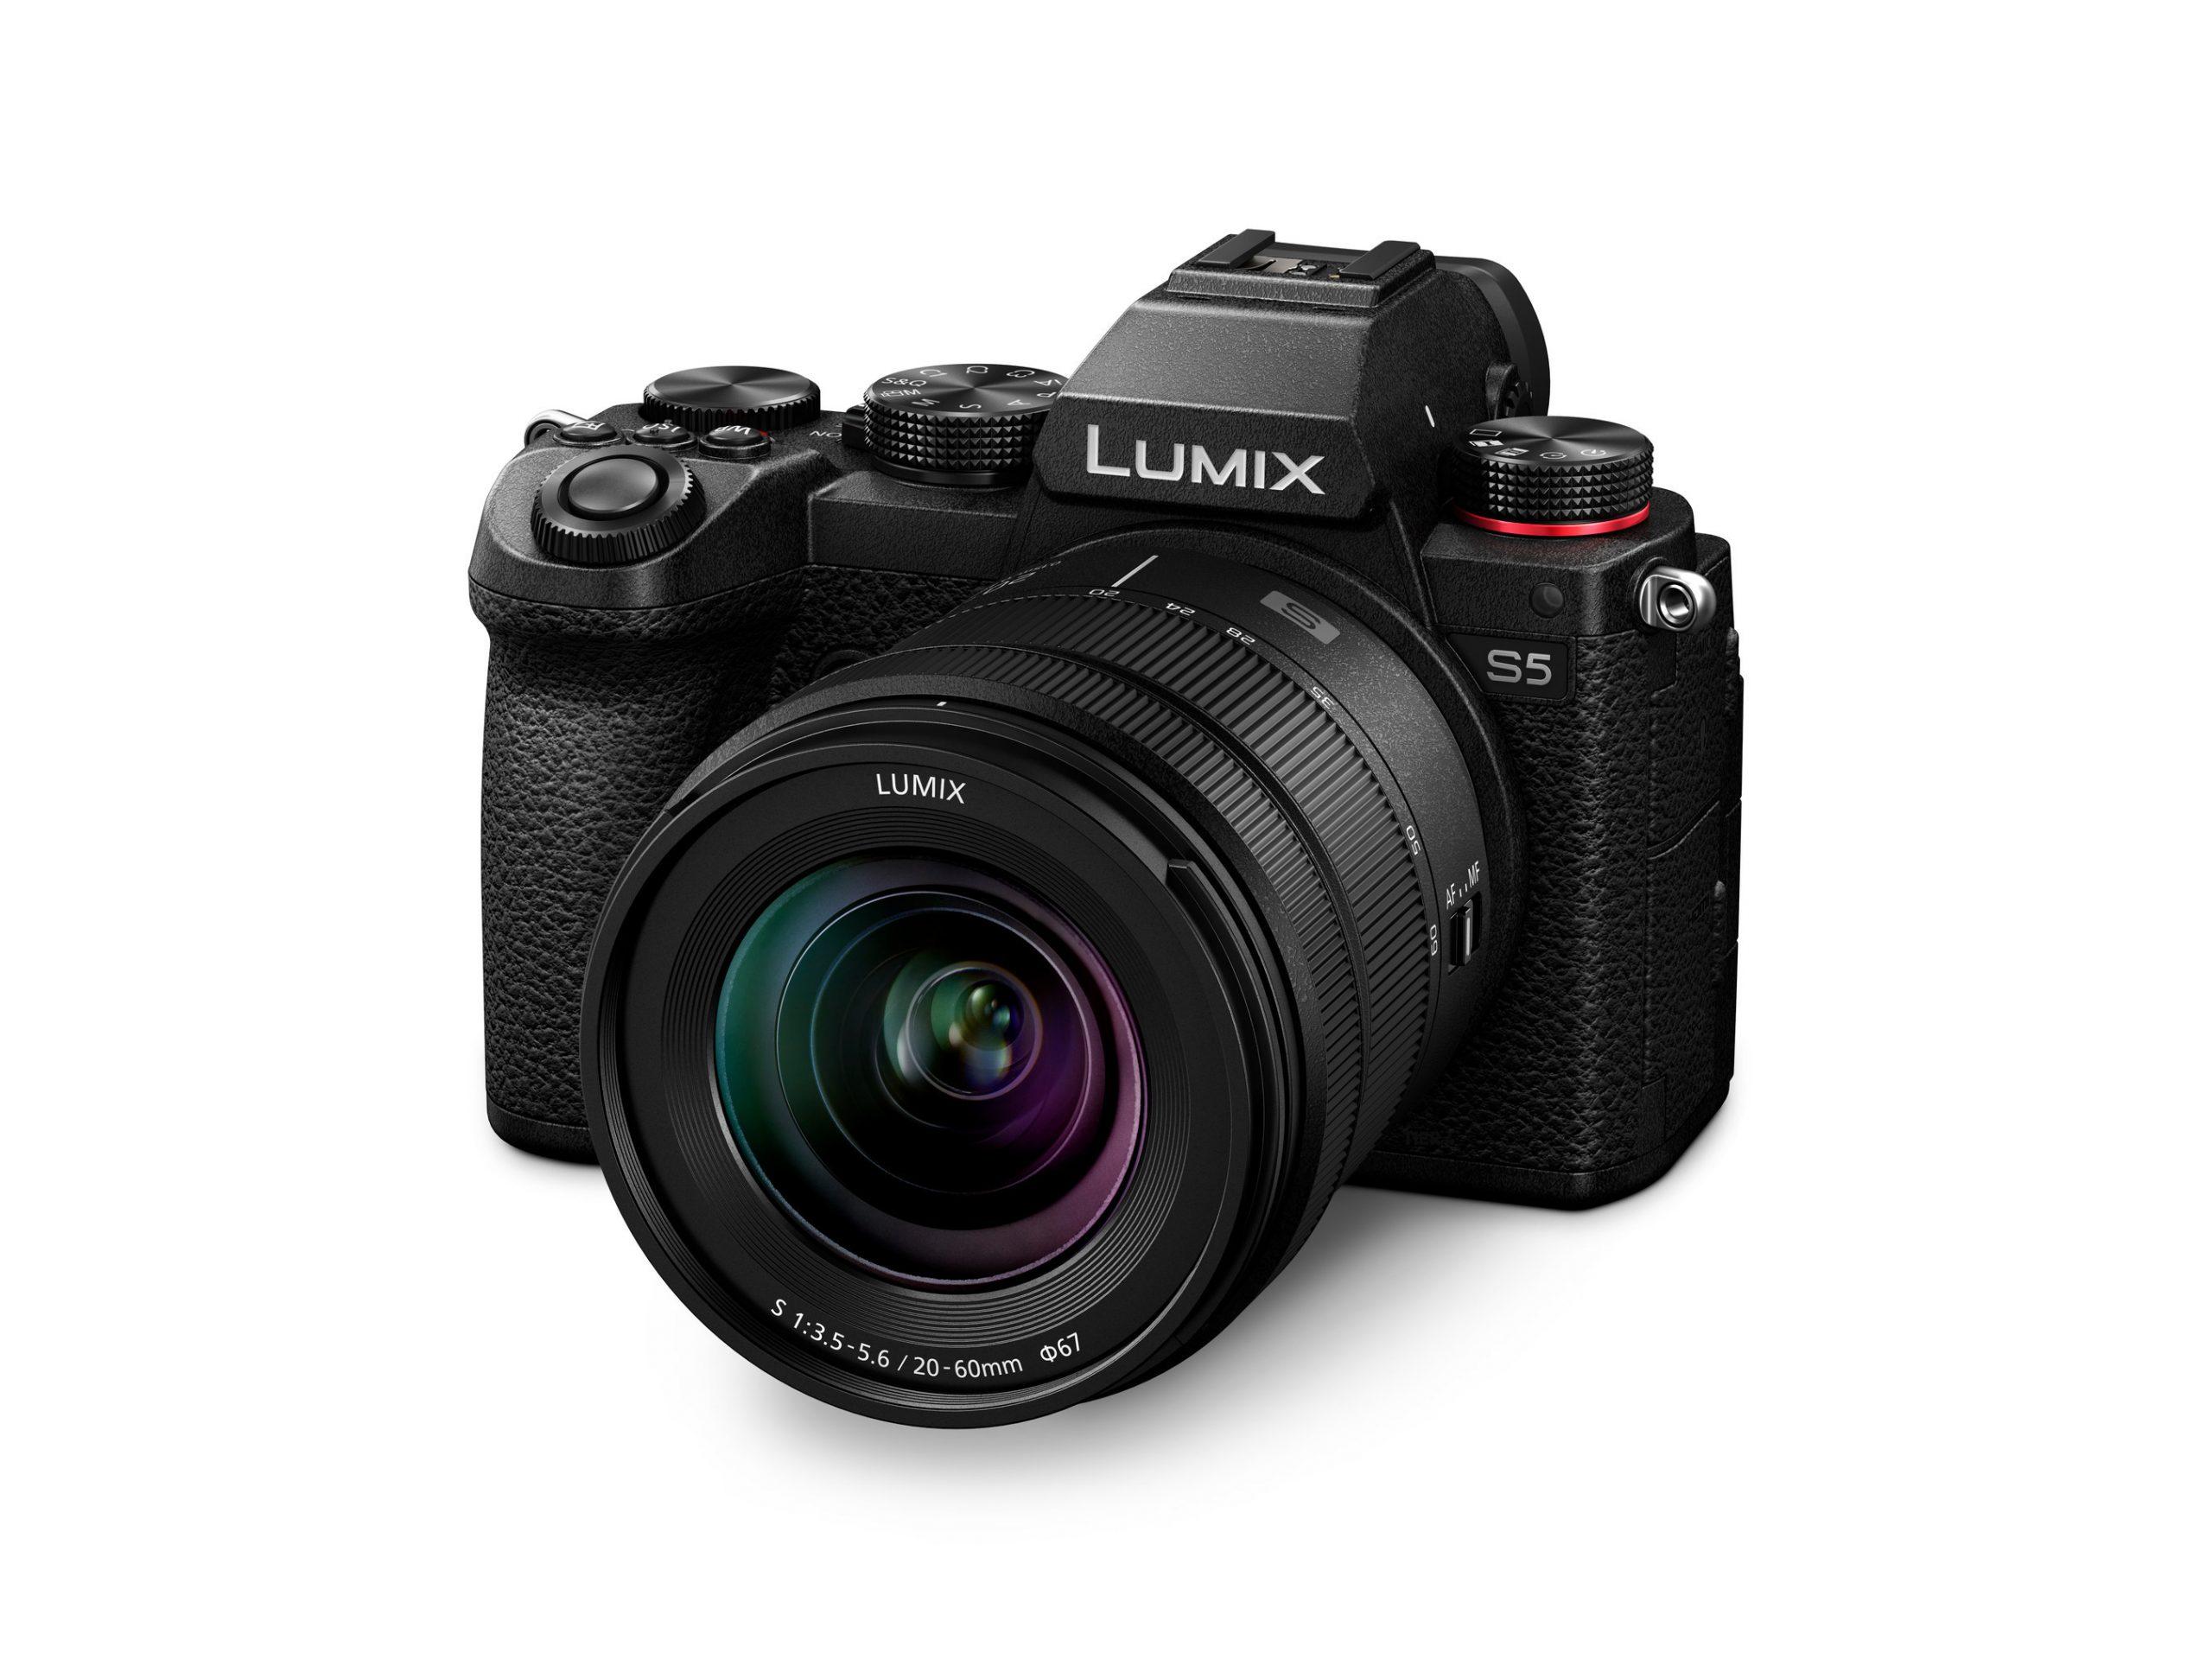 Best Mirrorless Camera For Professionals